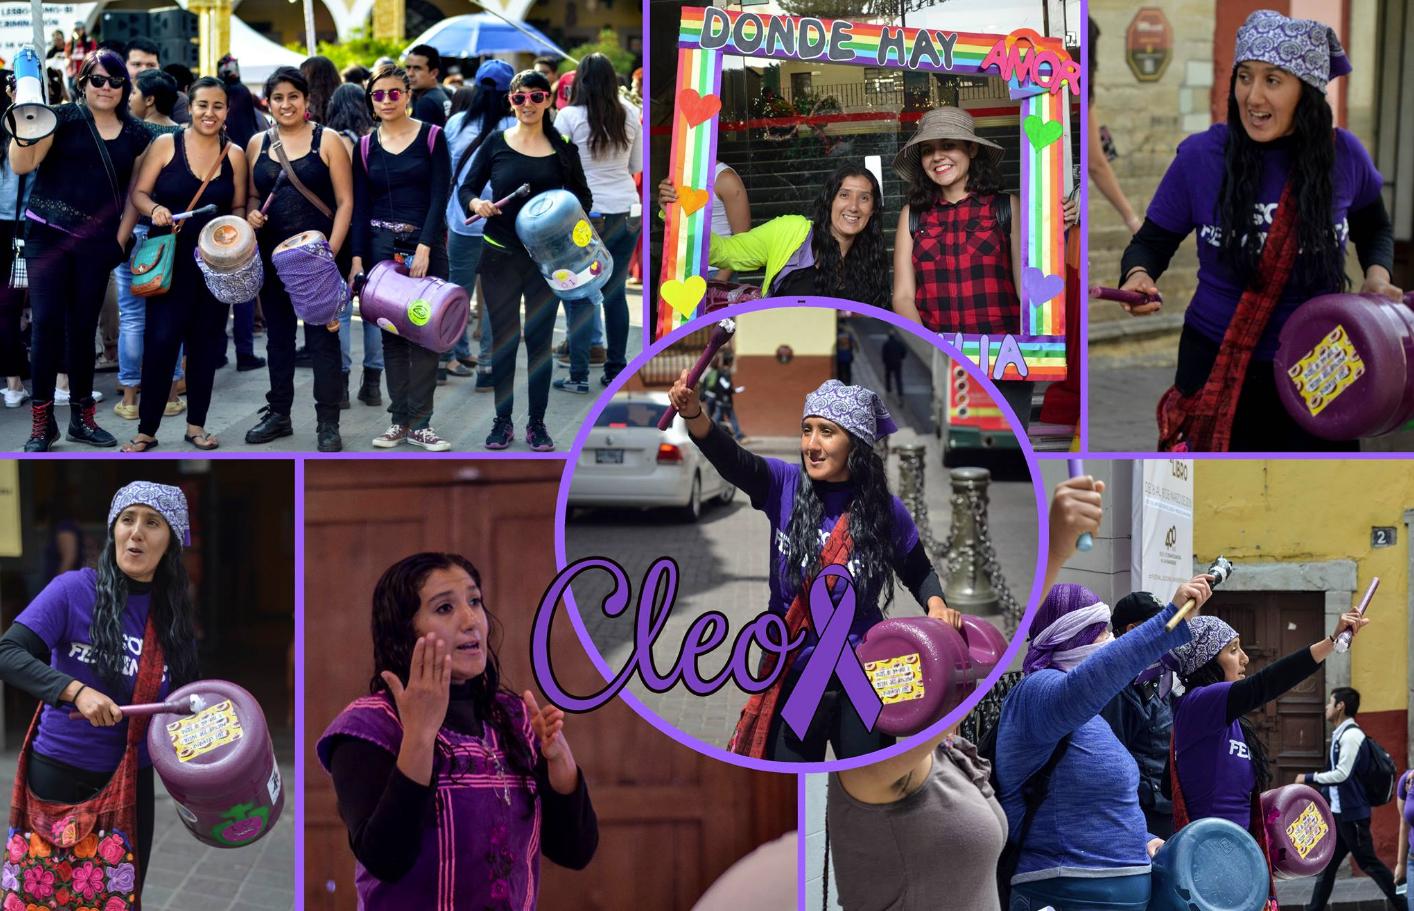 Kleo, activista, lesbiana y feminista, asesinada en Guanajuato